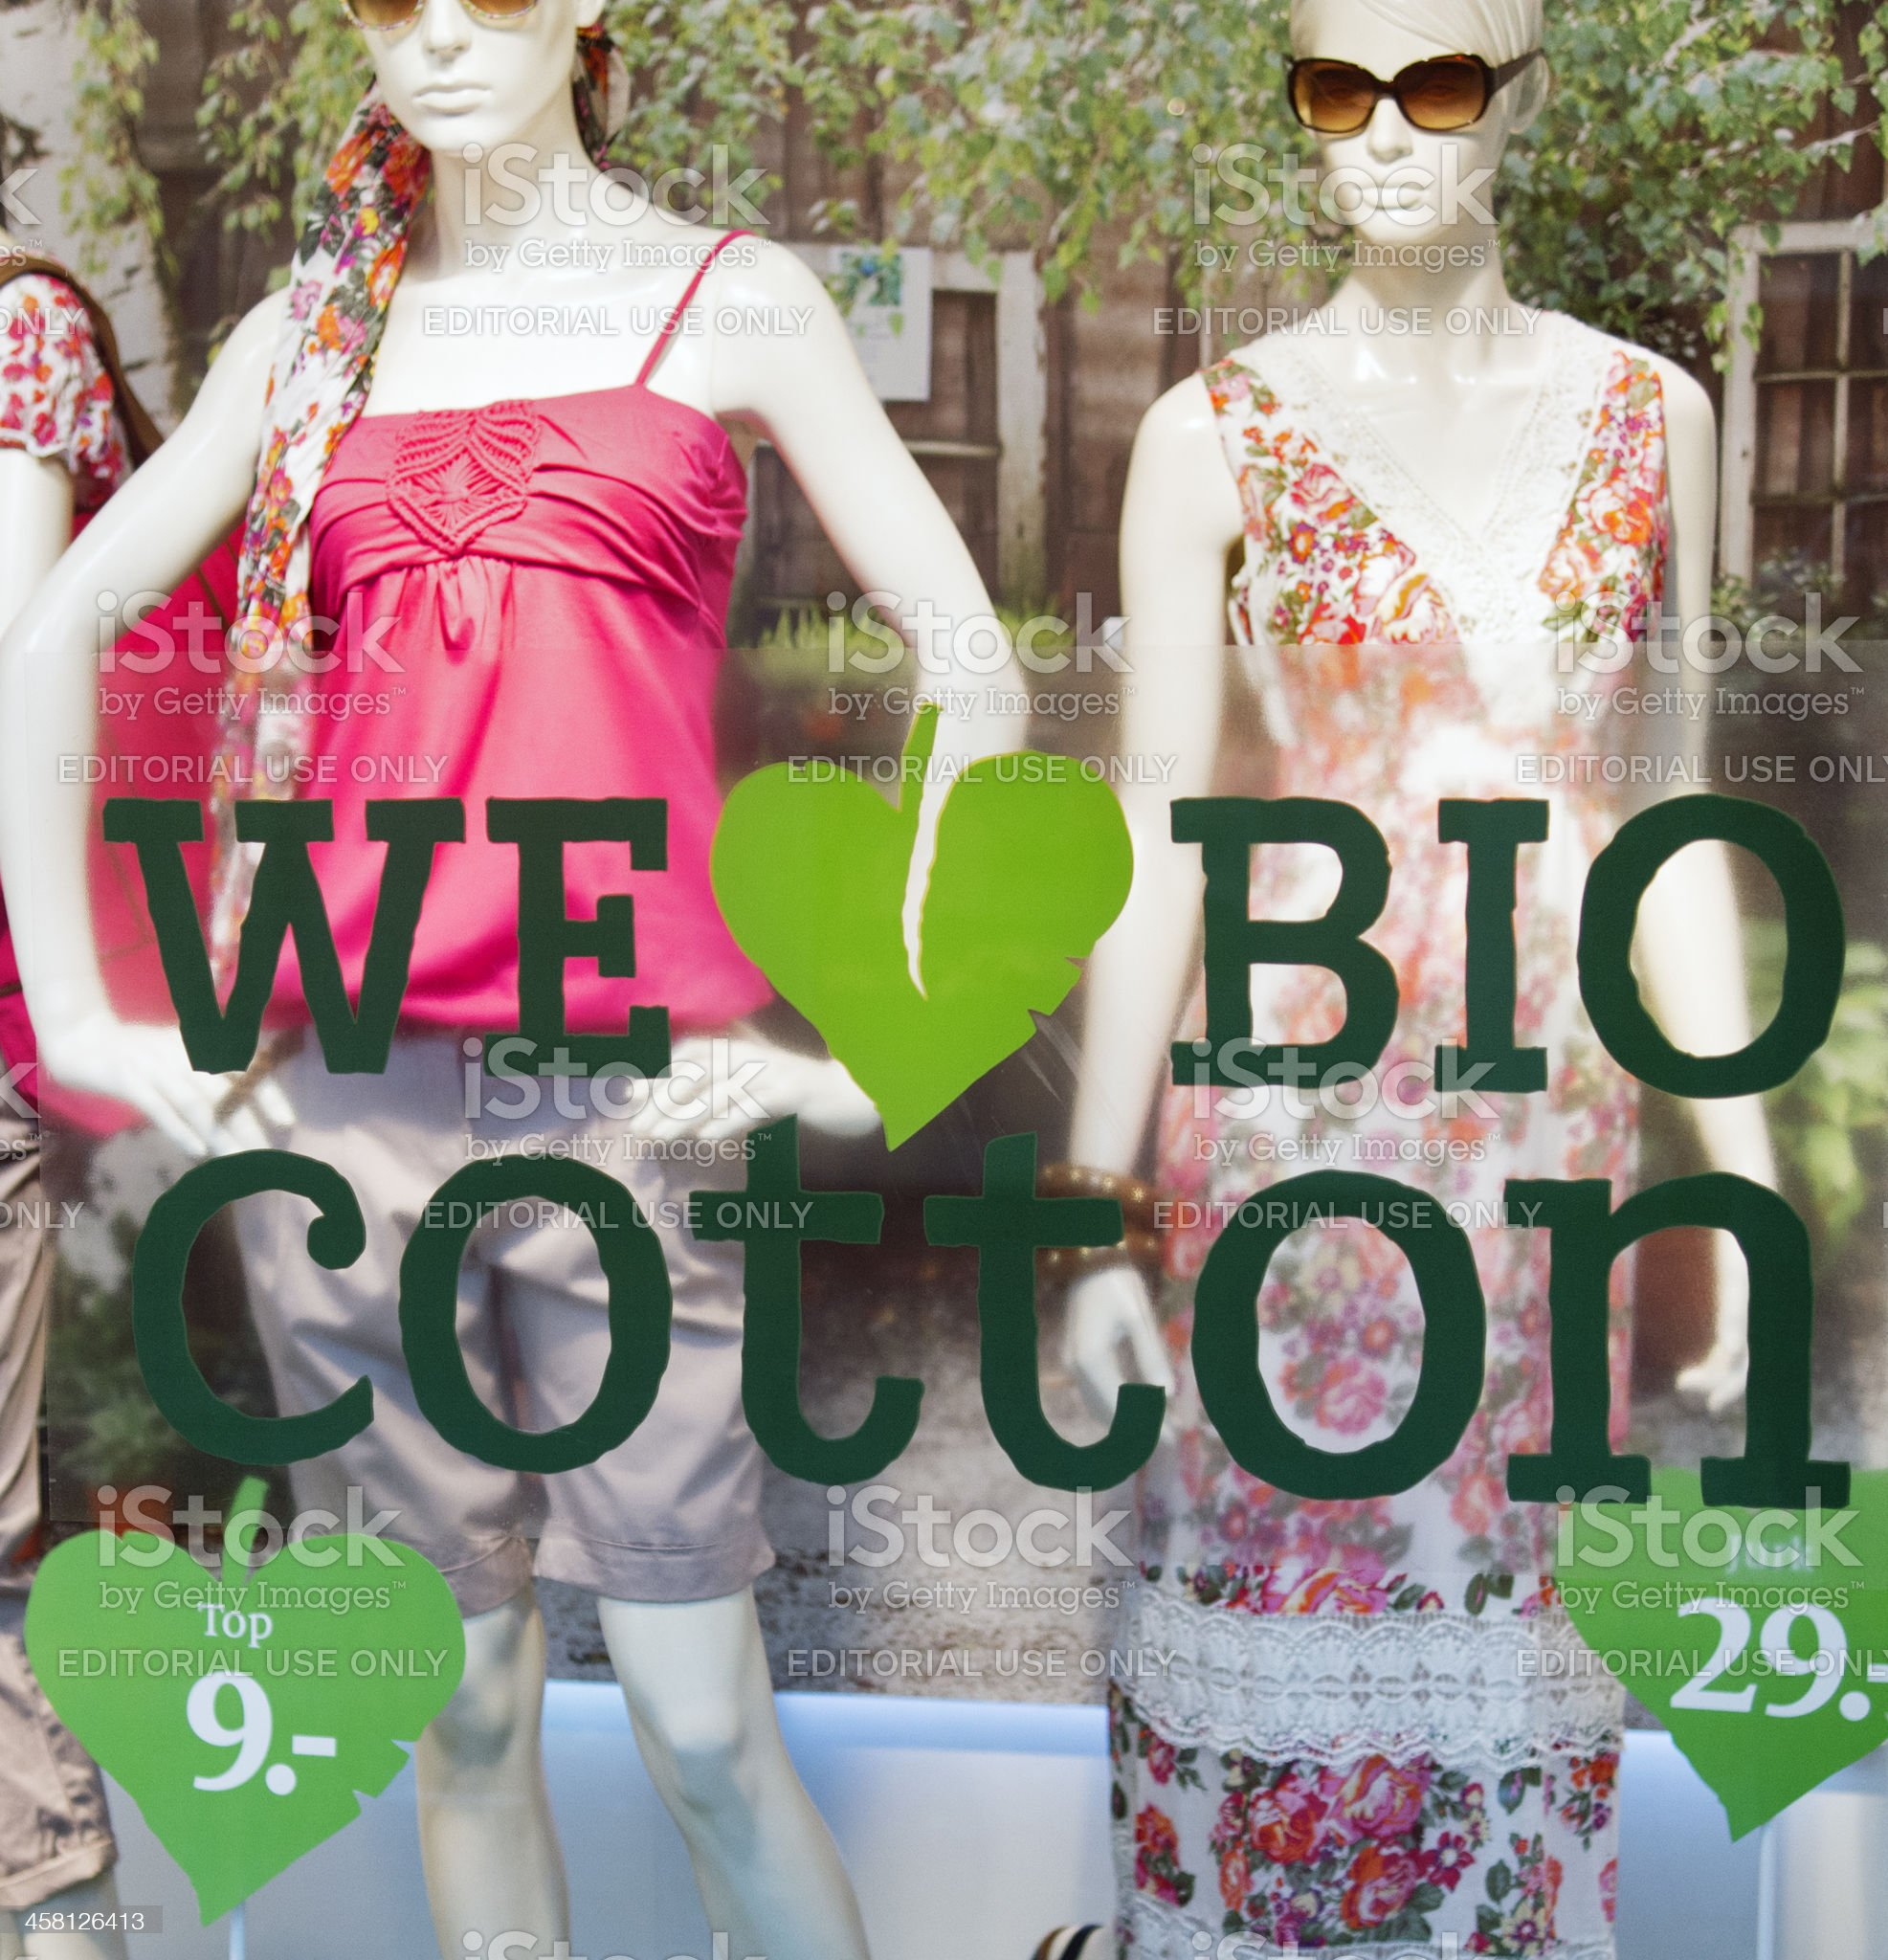 Fashion store window display royalty-free stock photo